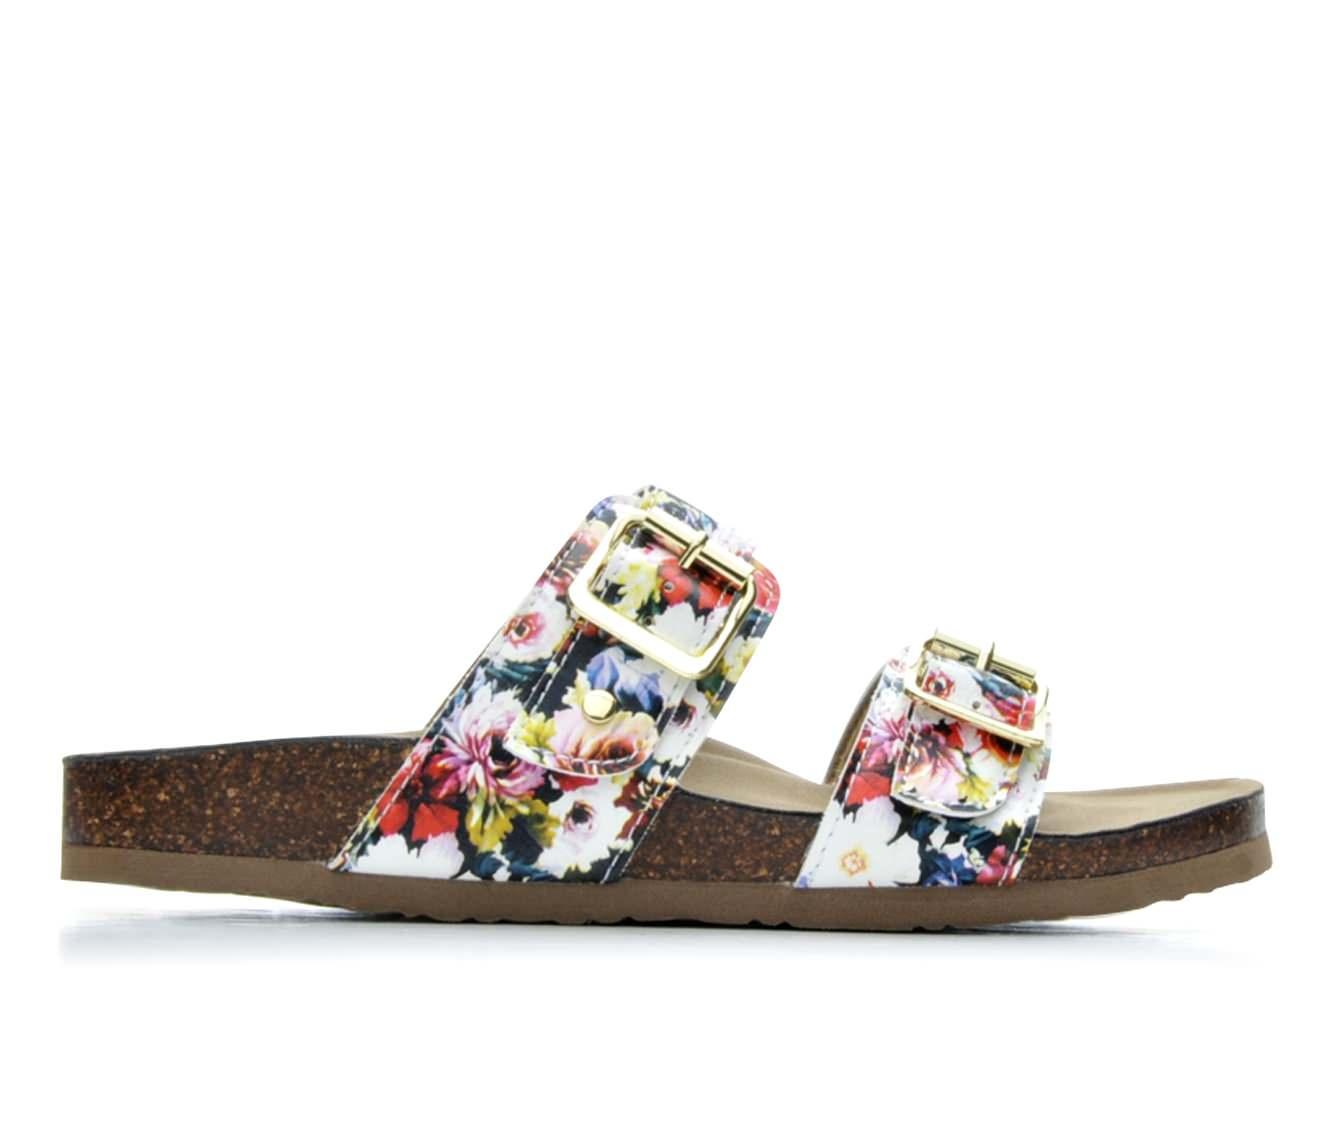 Women's Madden Girl Brando Sandals (Multicolor)